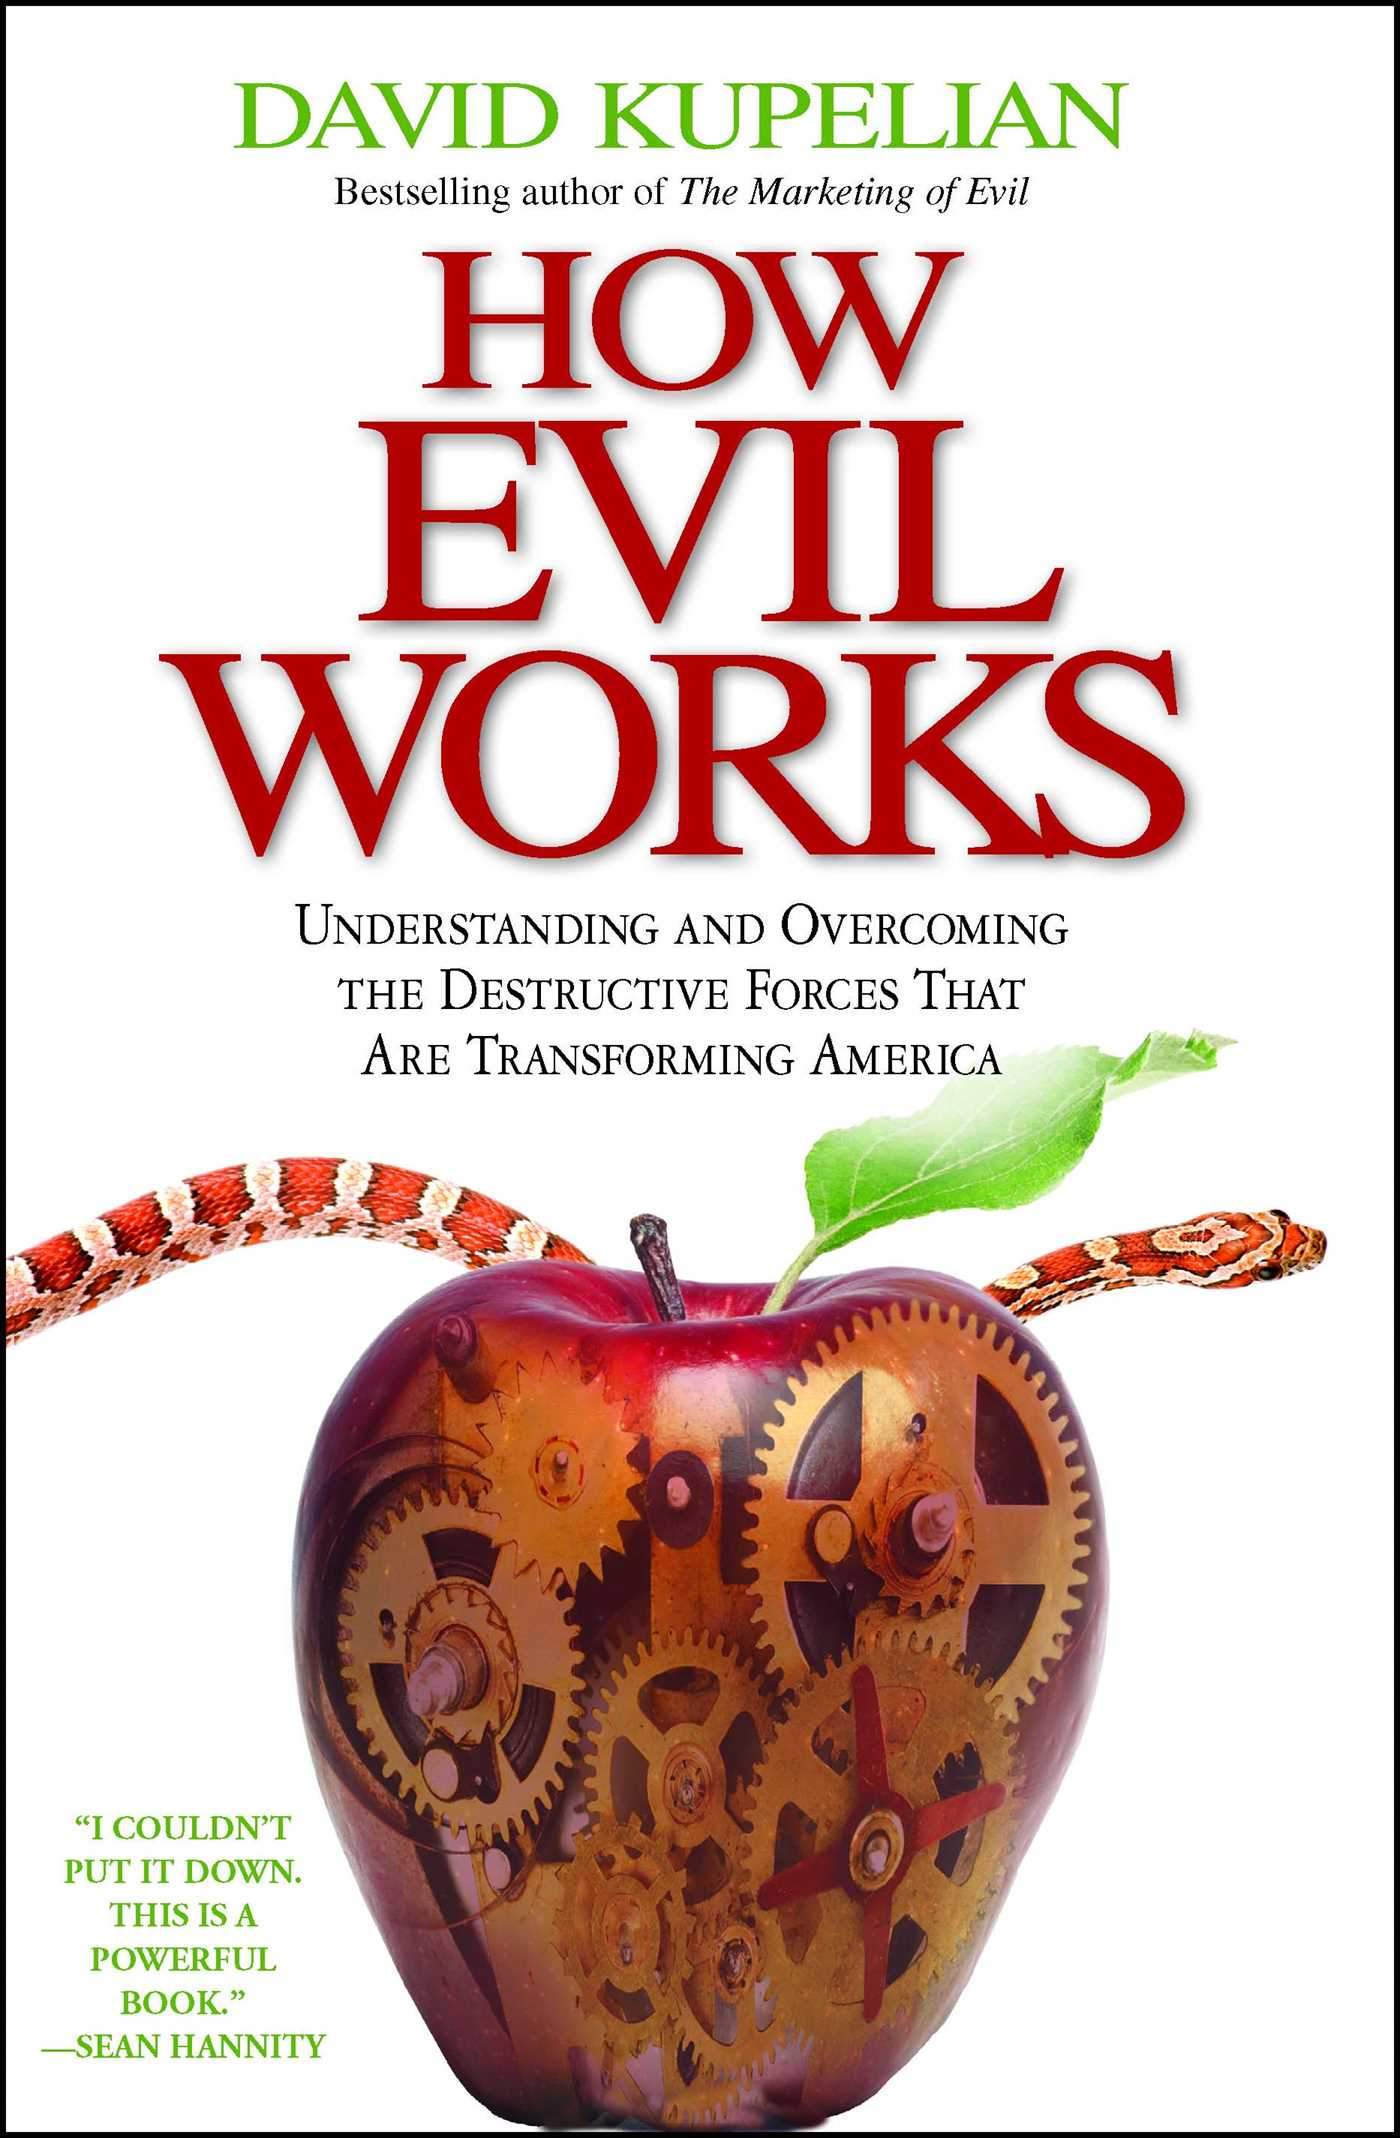 How evil works 9781439168646 hr